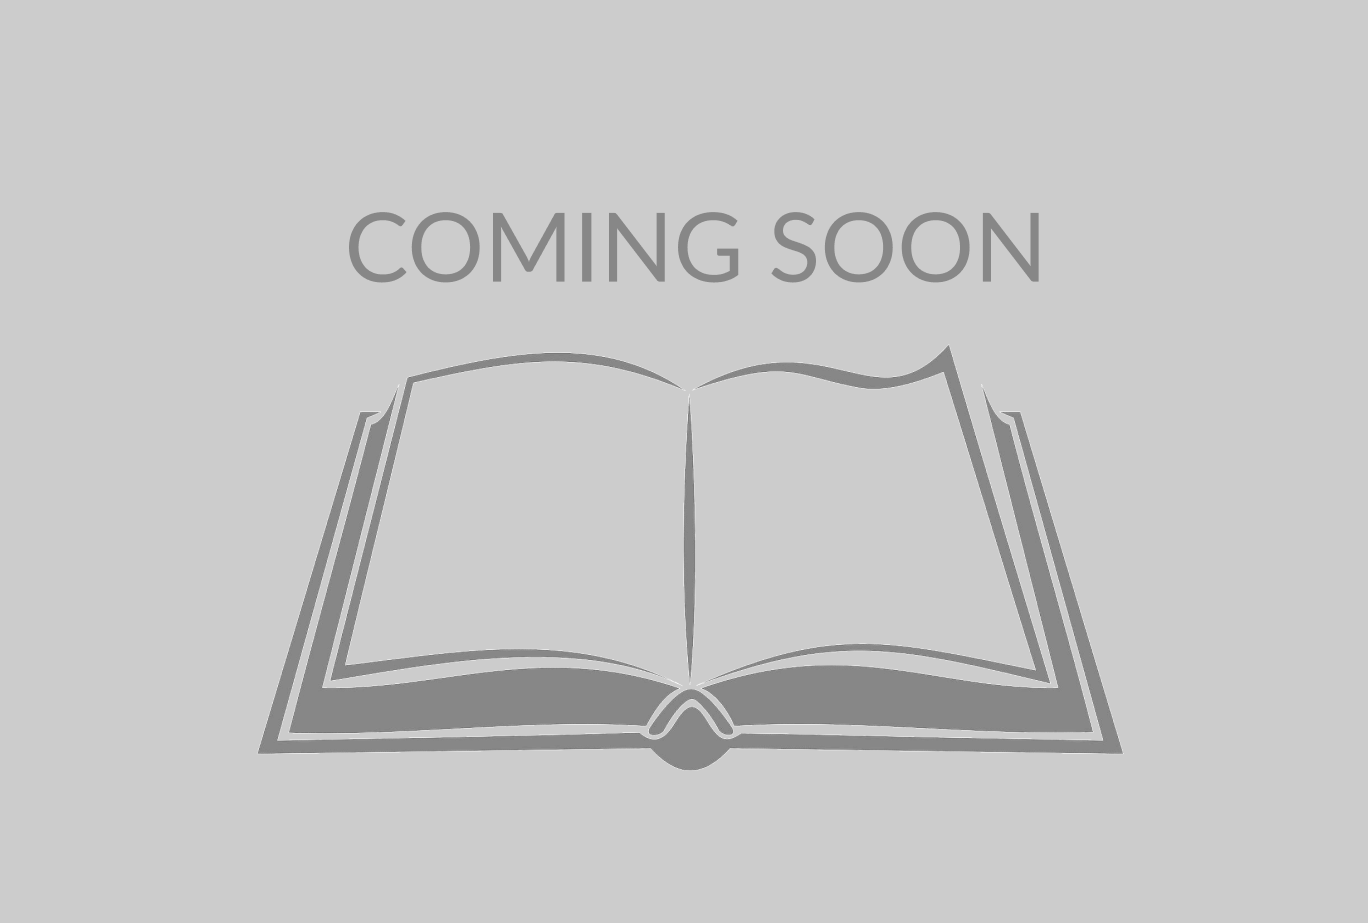 ebook-coming-soon